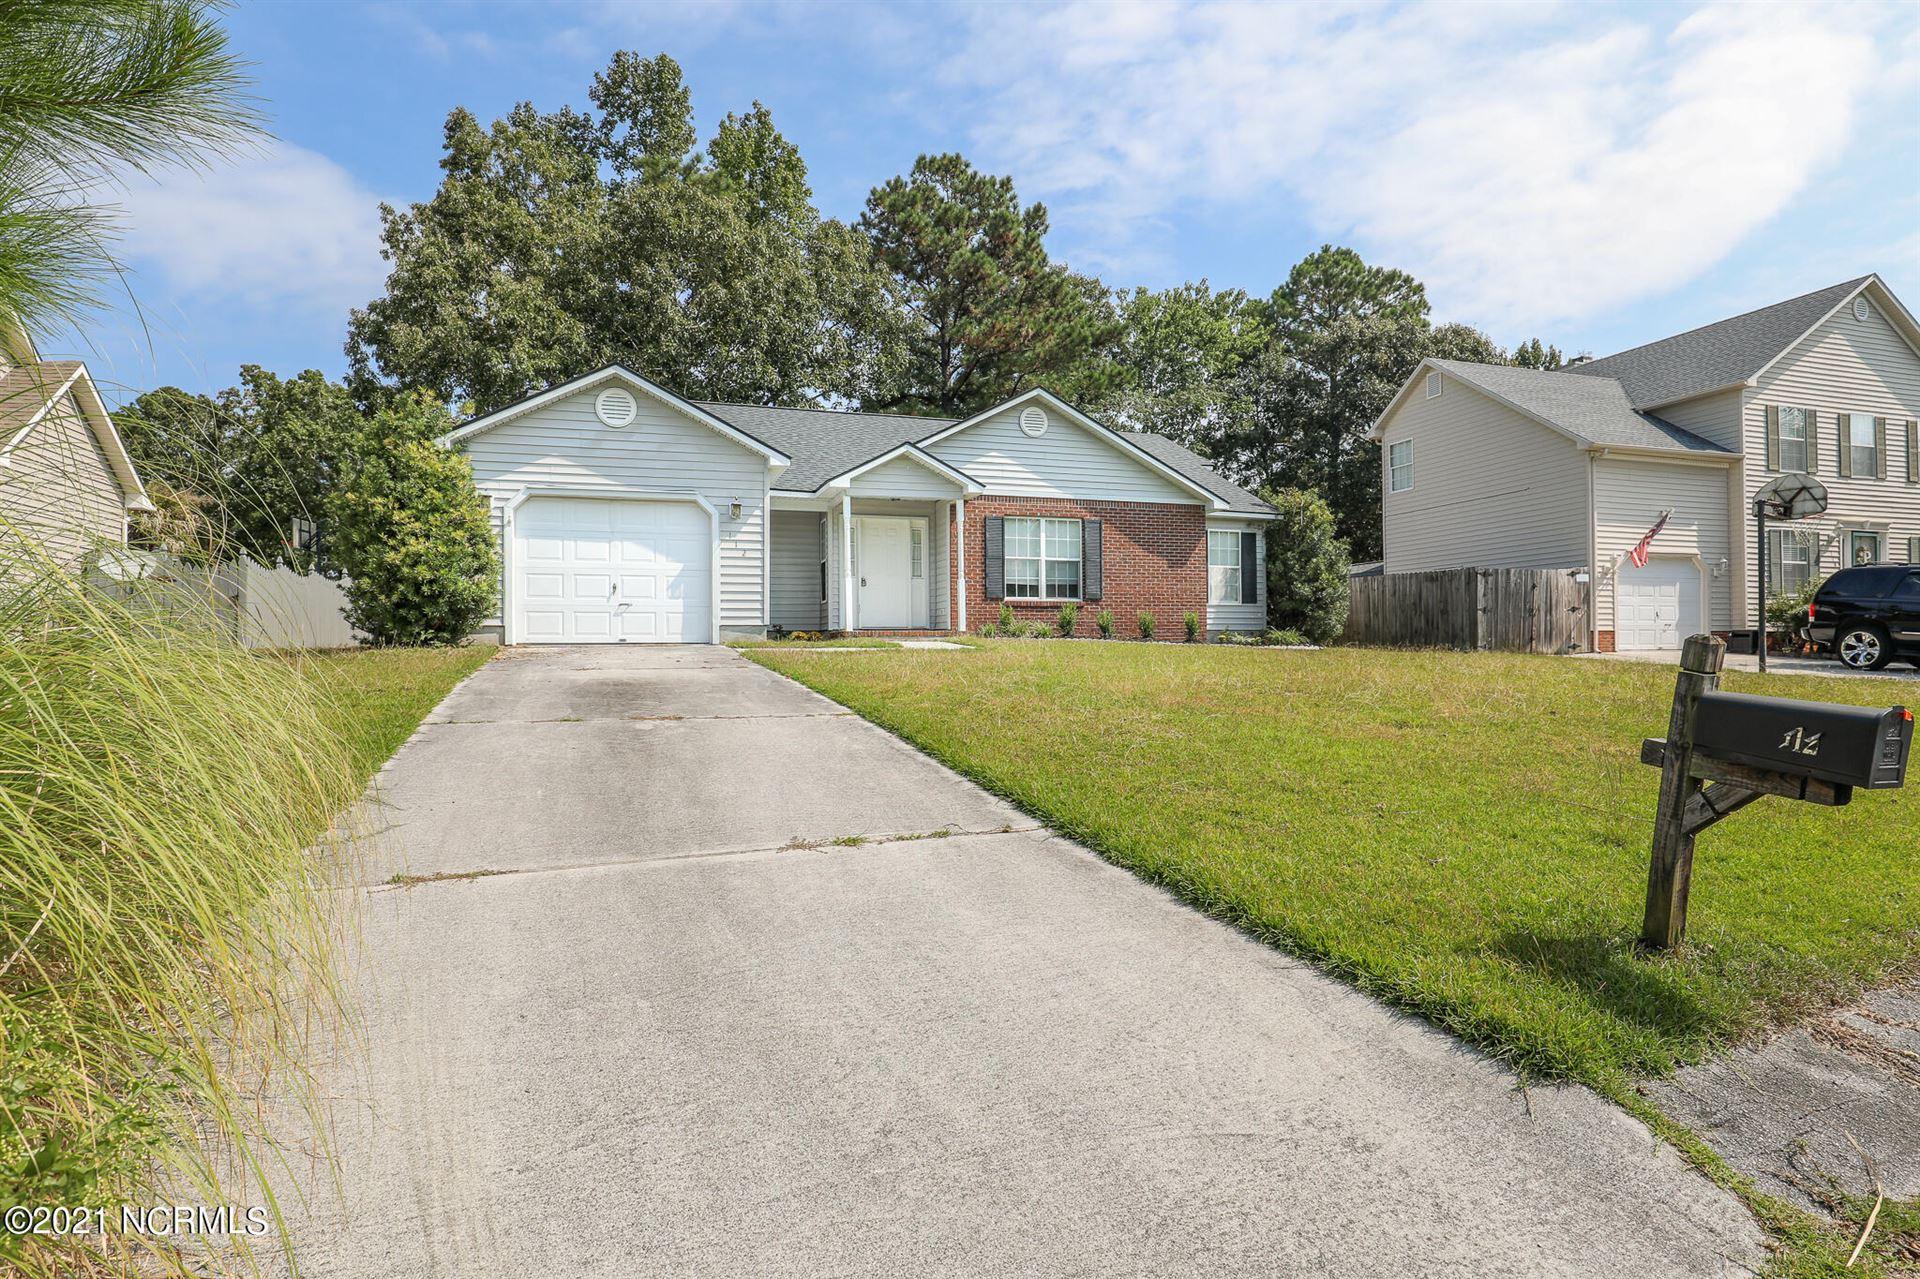 Photo of 112 Yellowwood Drive, Jacksonville, NC 28546 (MLS # 100293536)